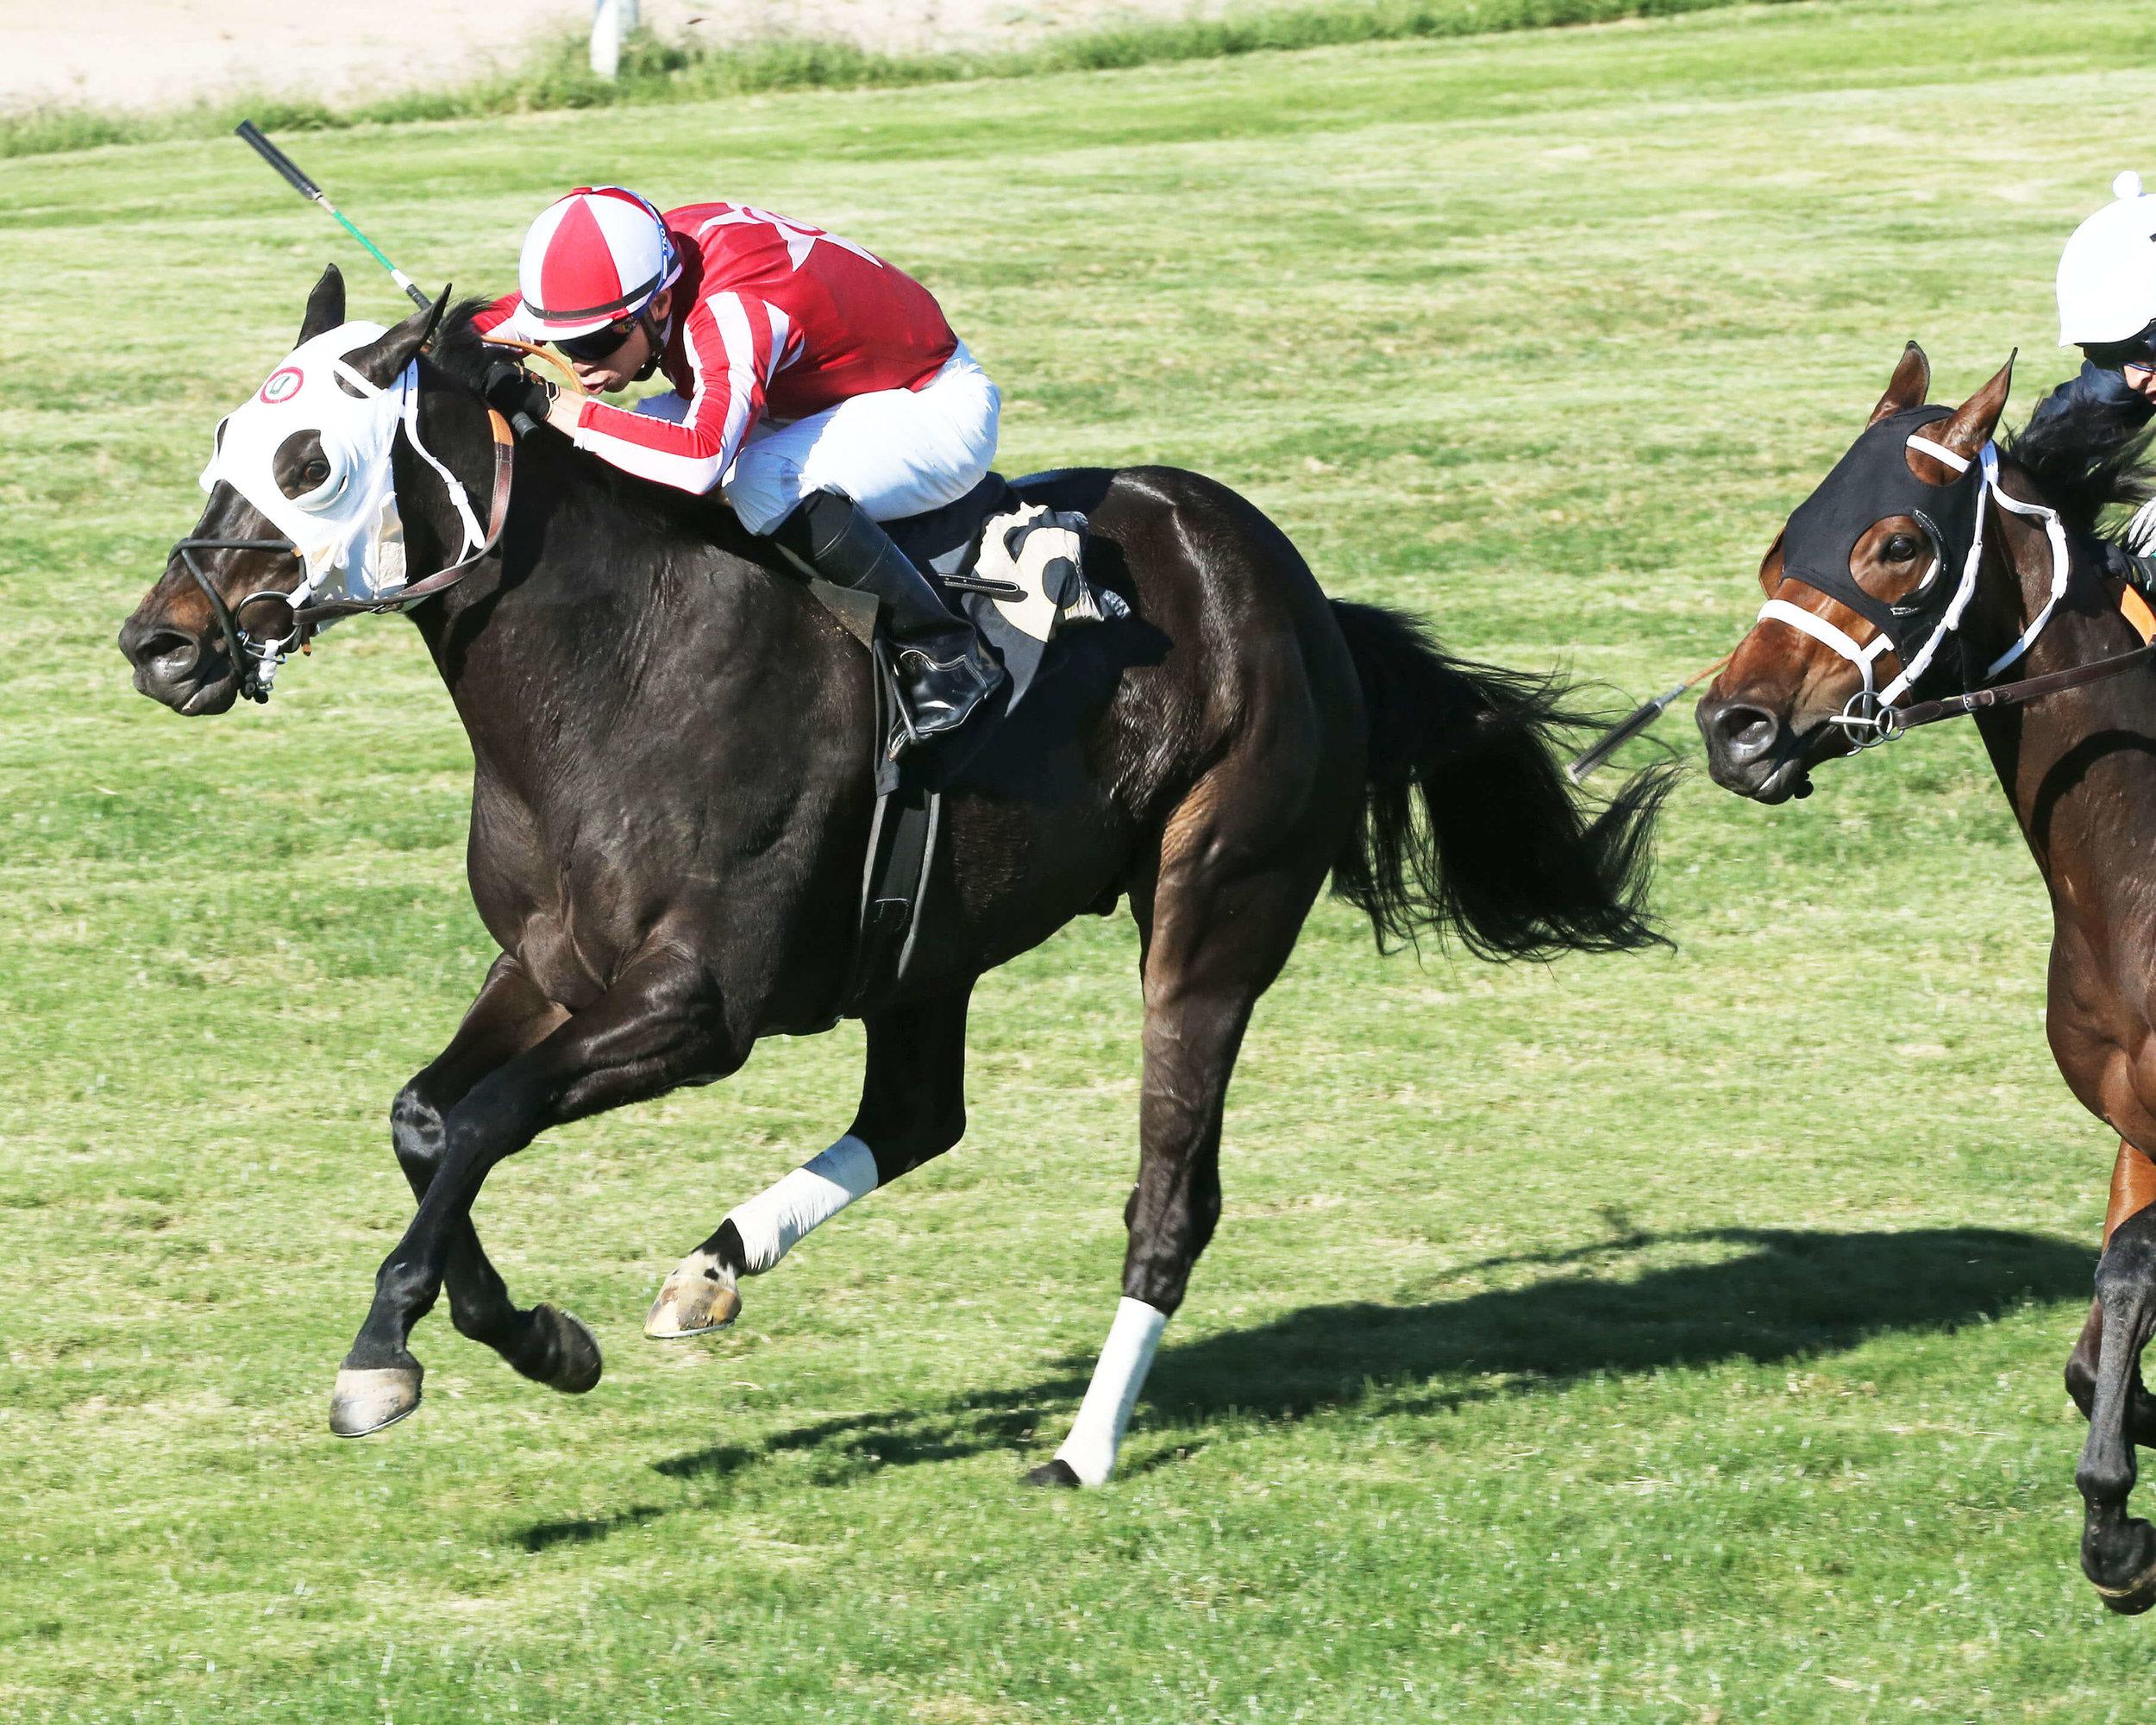 Twelve Tribes - Jeff & Jack Coady, Sr Stakes - 11-08-14 - R05 - TUP - Inside Finish (1).jpg